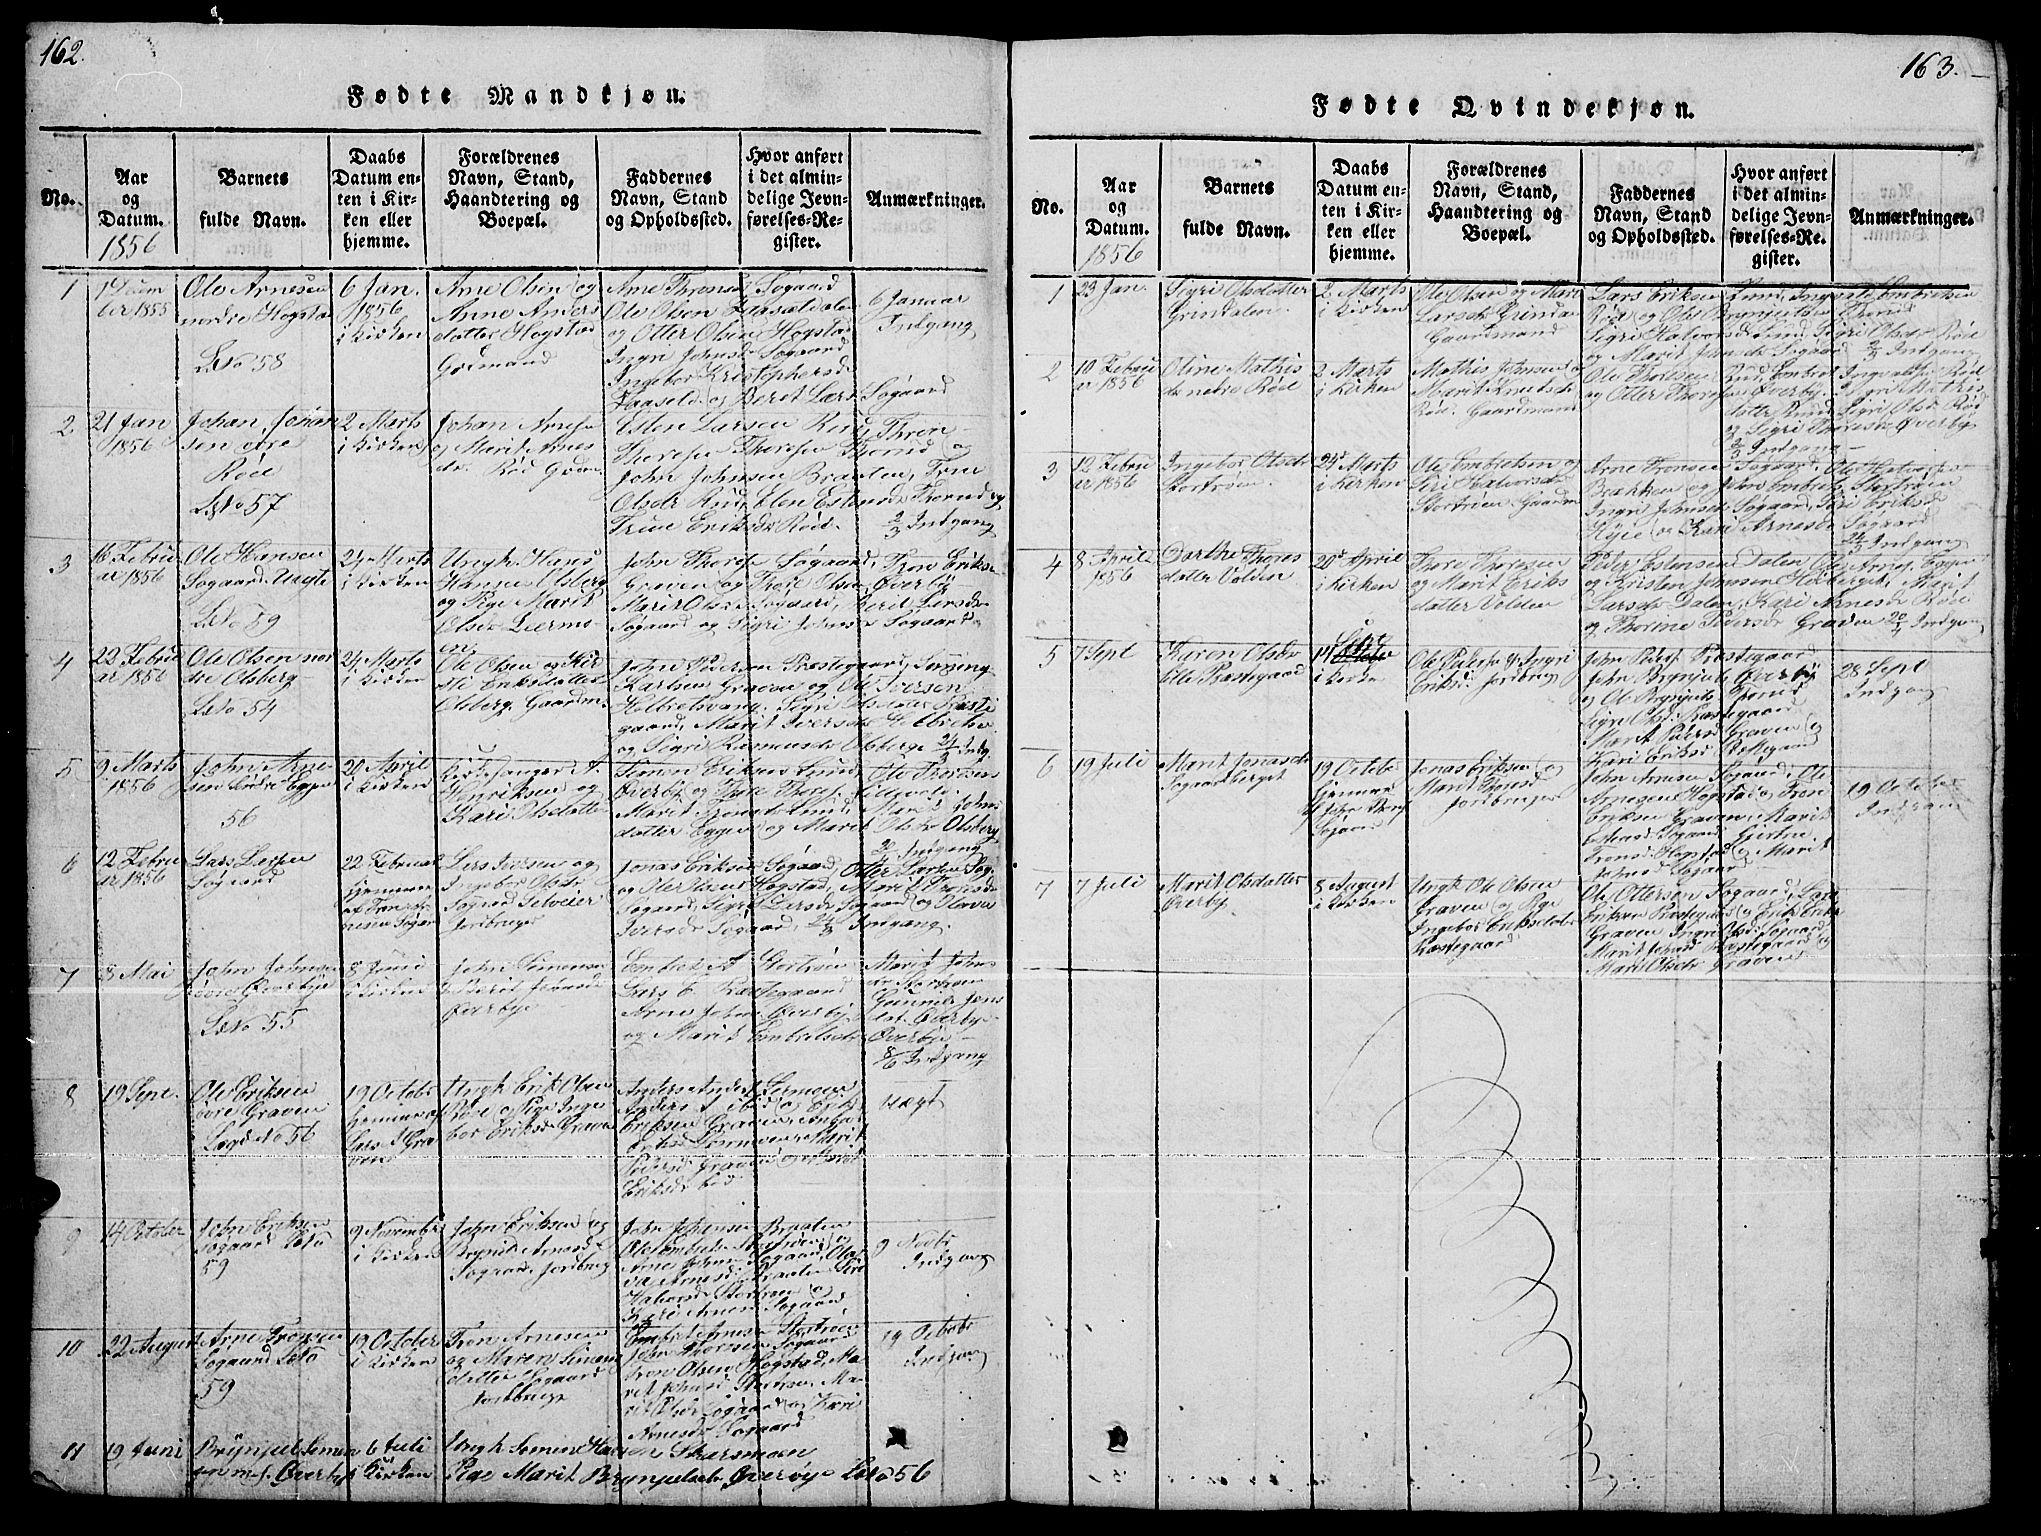 SAH, Tynset prestekontor, Klokkerbok nr. 4, 1814-1879, s. 162-163